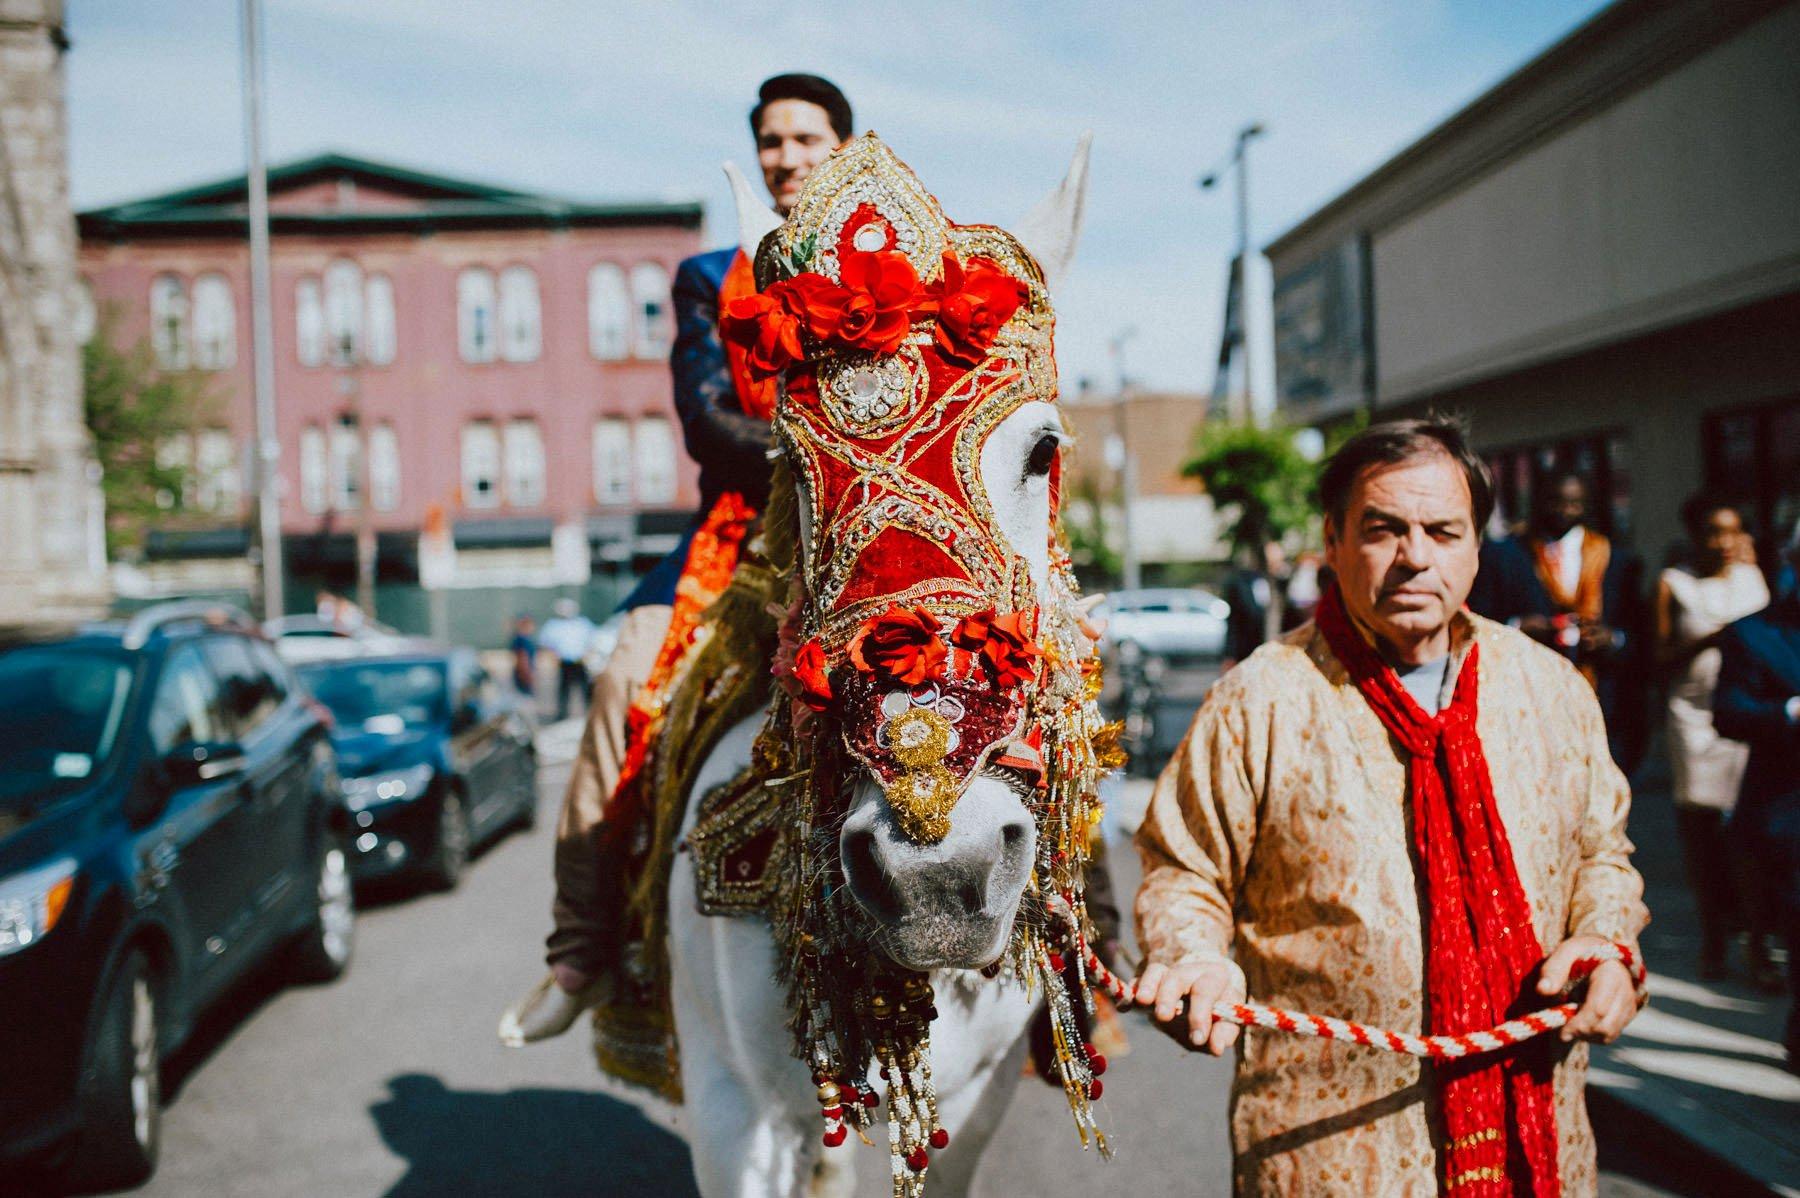 vie-philadelphia-indian-wedding-56.jpg